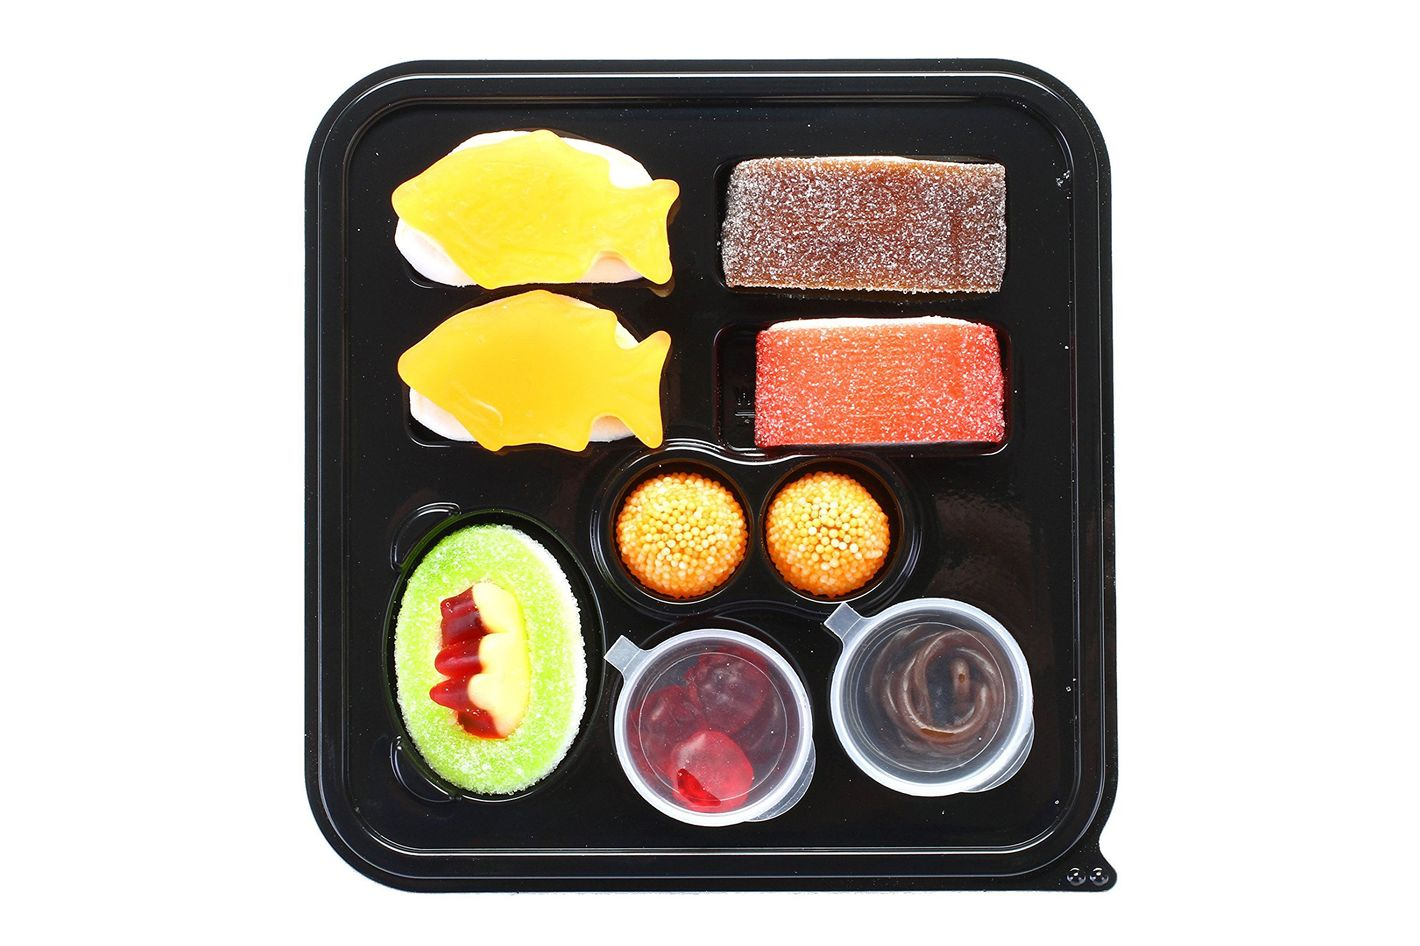 Raindrops Mini Candy Gummy Sushi Bento Box